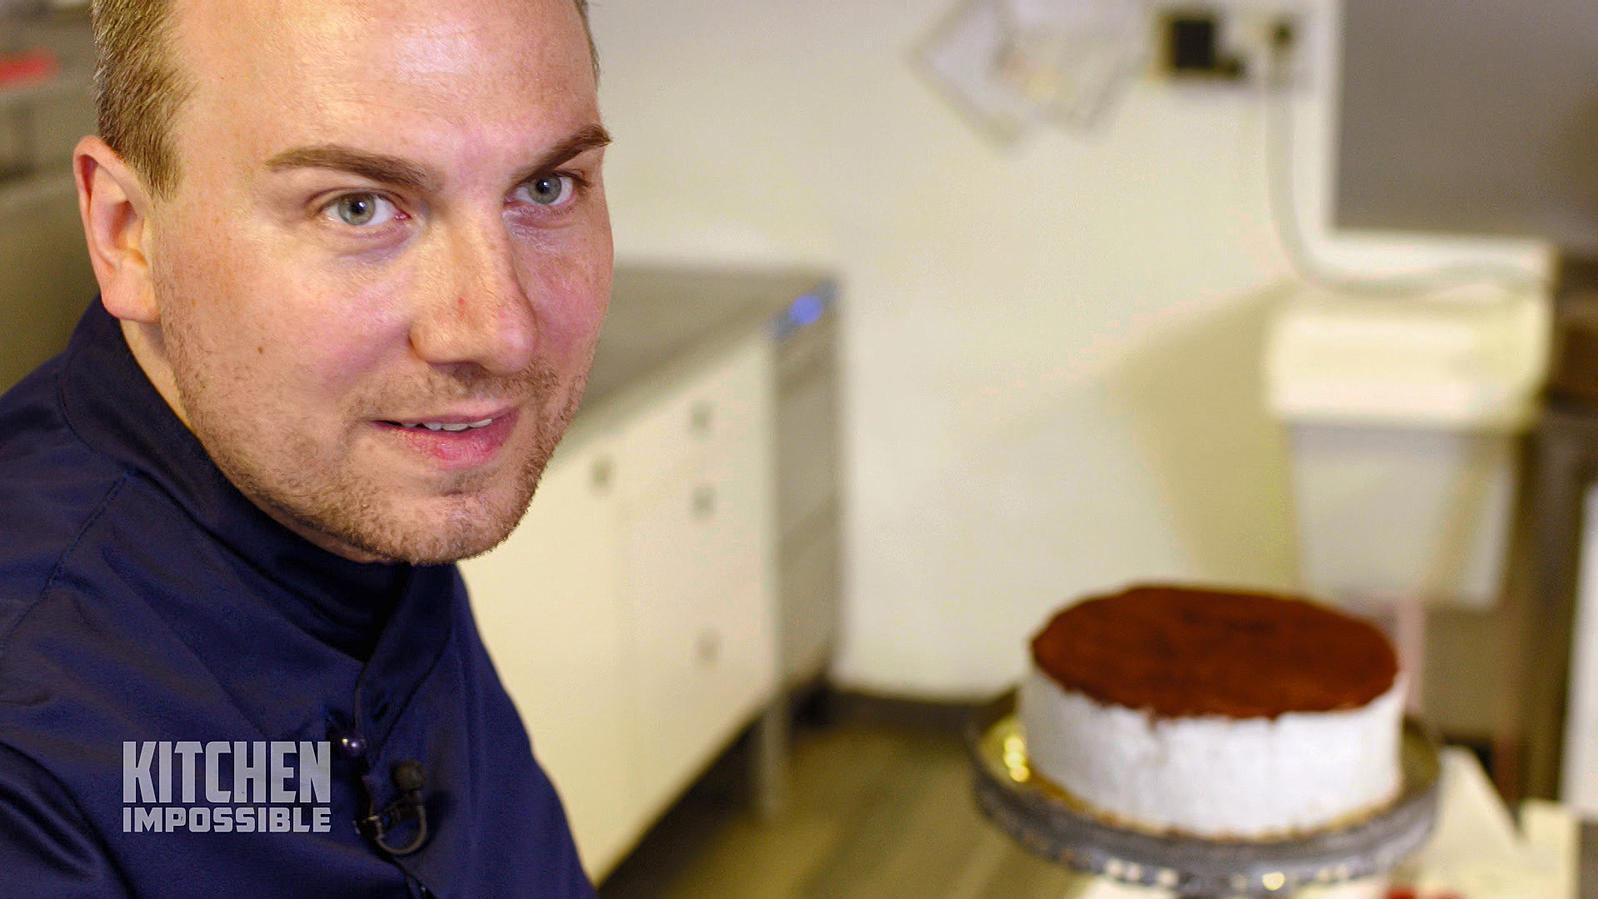 Kitchen Impossible Tim Raue